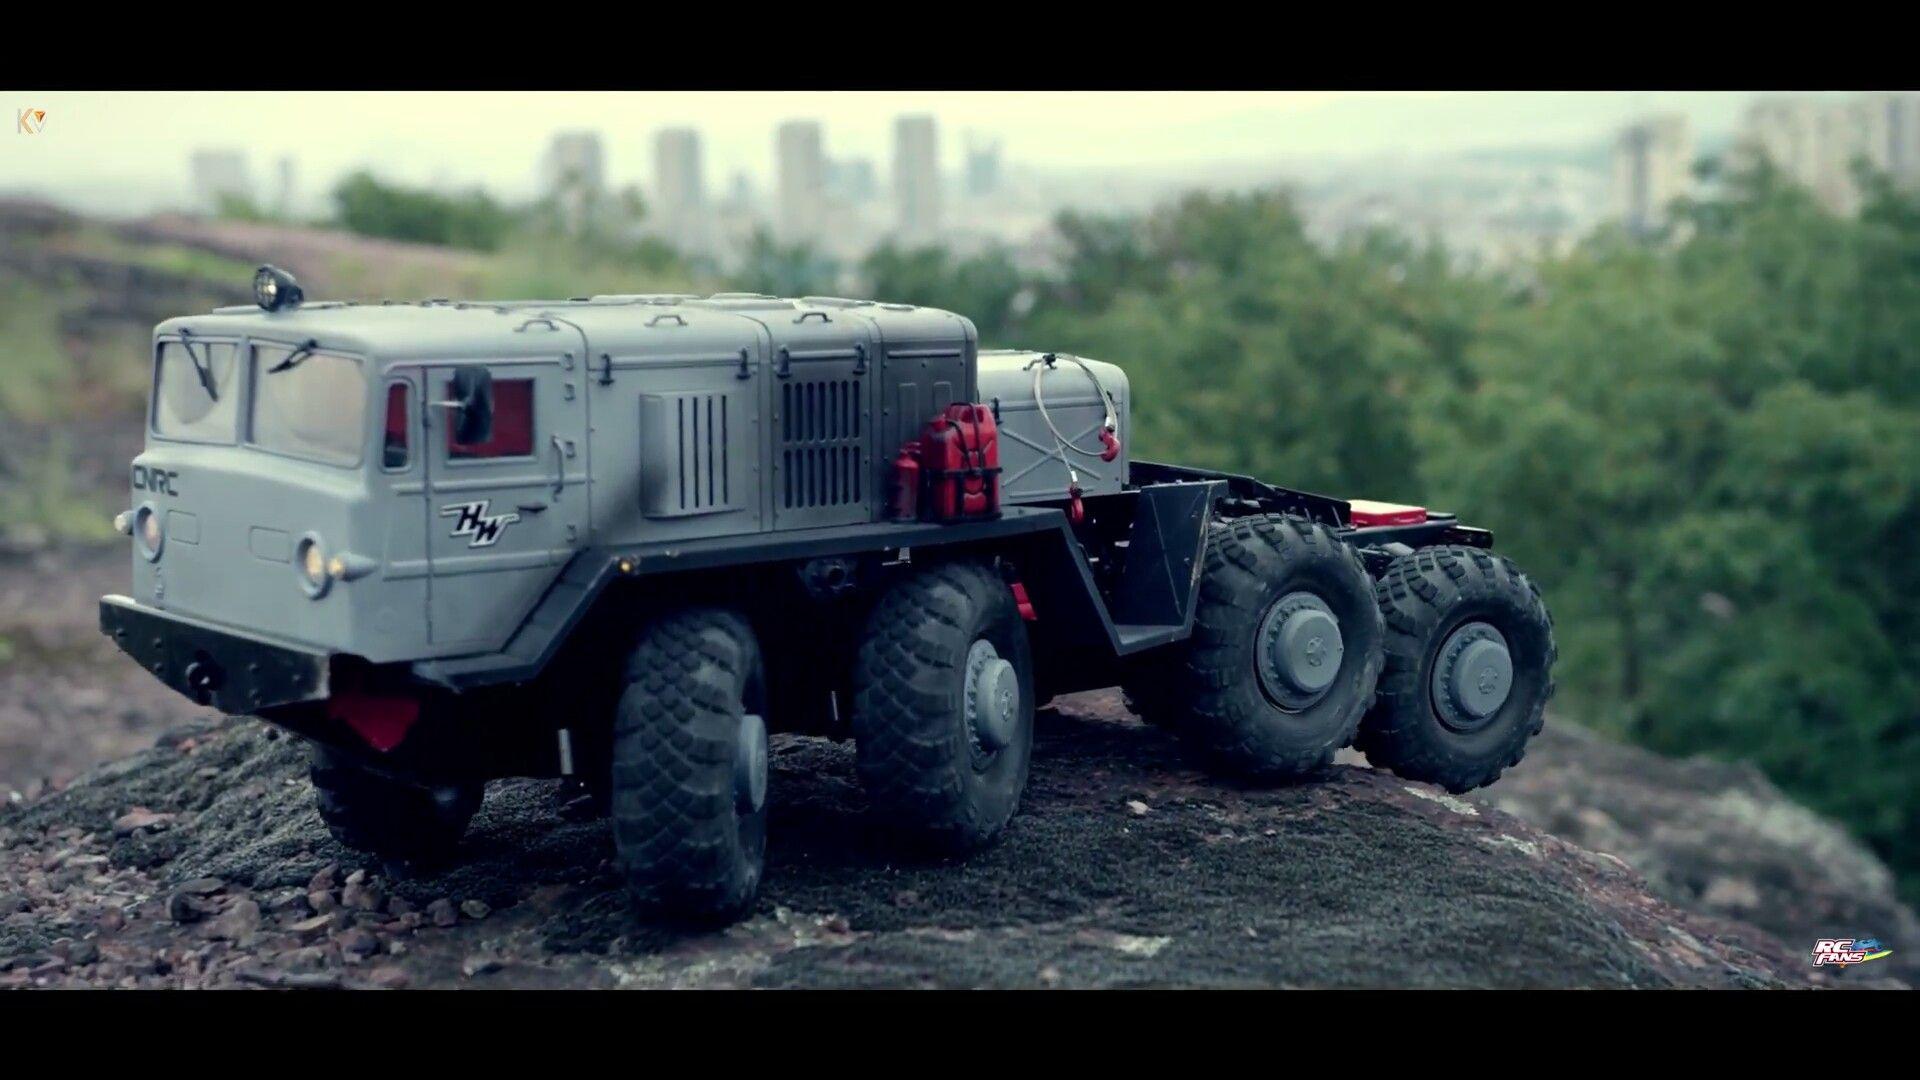 Cross RC BC8 Mammoth | Cross RC Fan | Monster trucks, Trucks